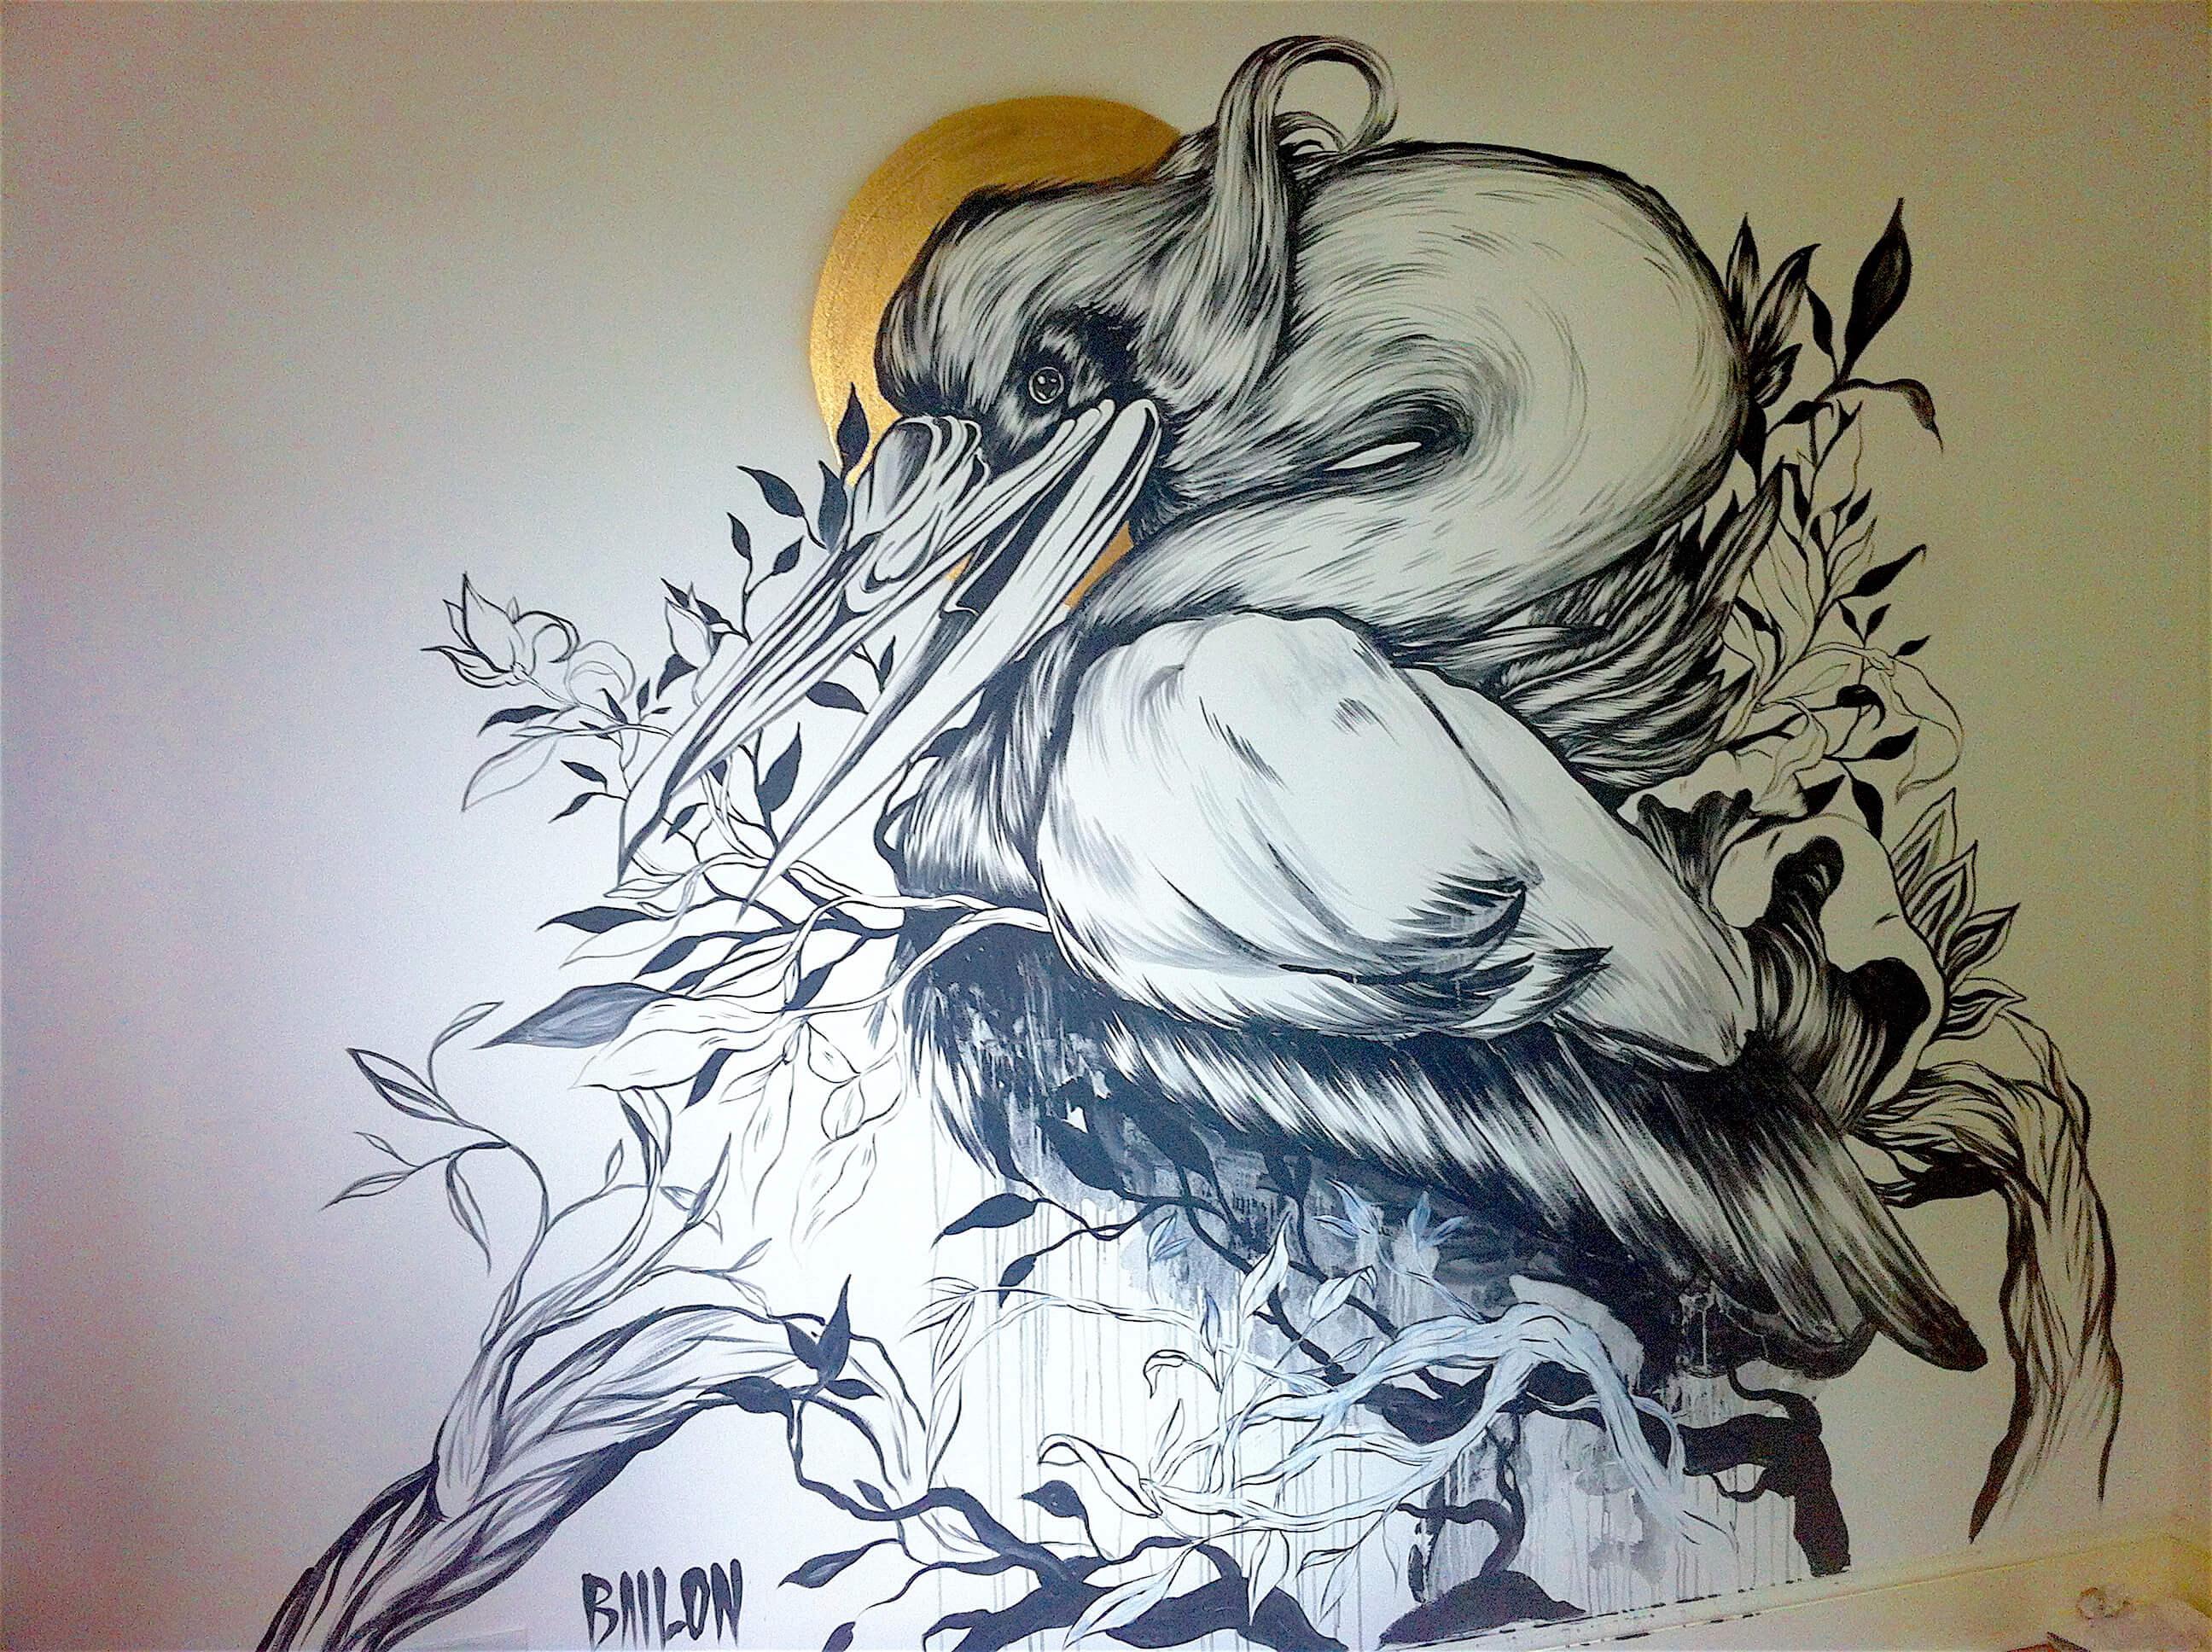 Mateus Bailon, mural commission, street art, painting, Inigo Art Advisory